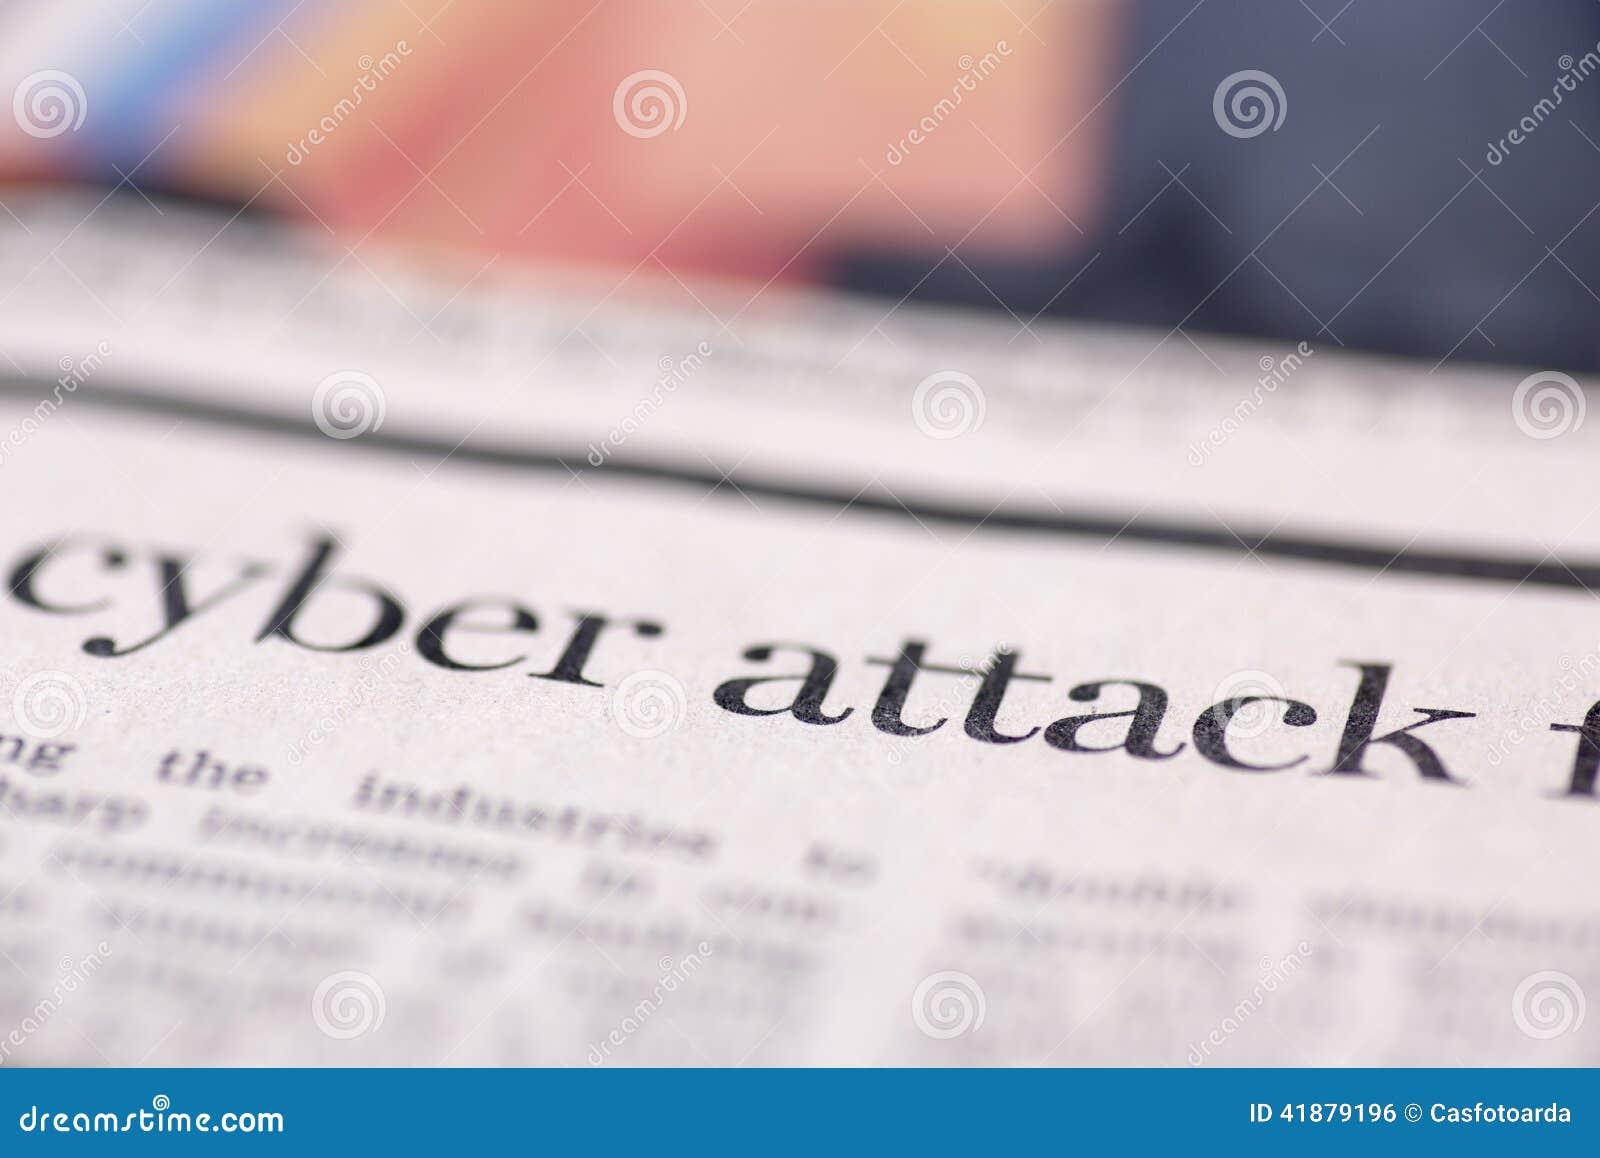 Periódico escrito ataque cibernético